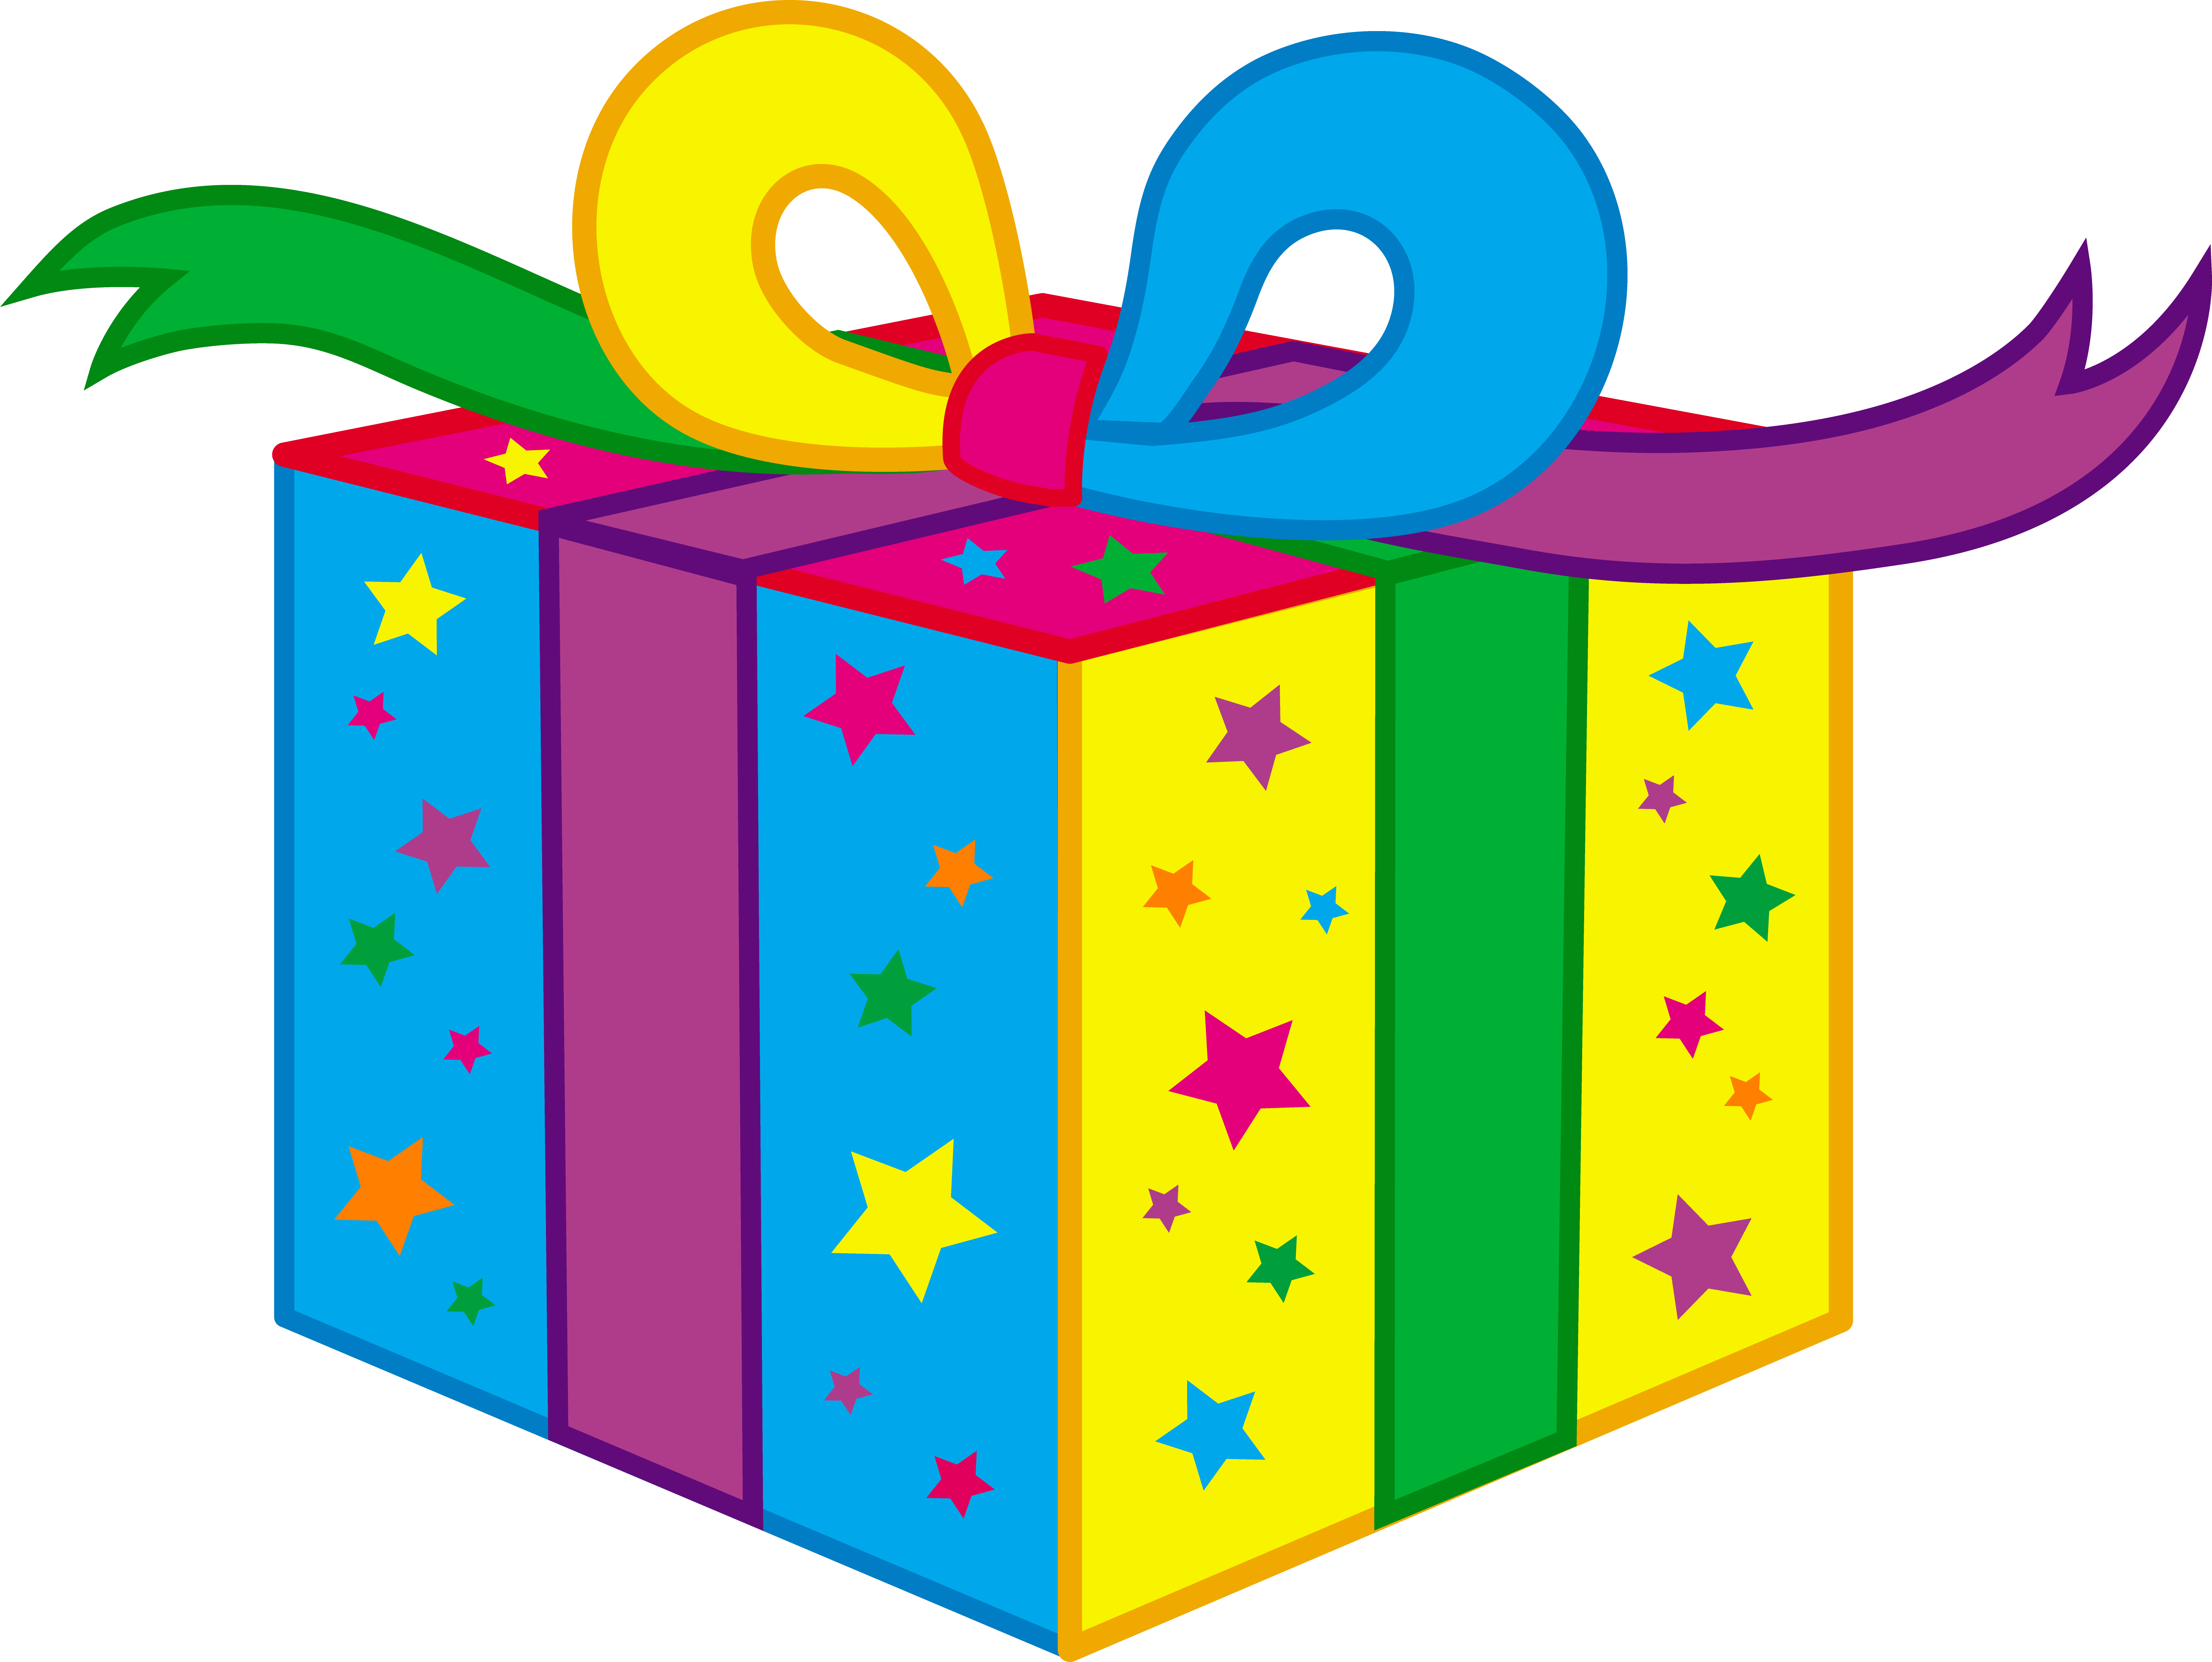 Birthday Clipart U0026middot; Free Birth-birthday clipart u0026middot; free birthday clipart-5